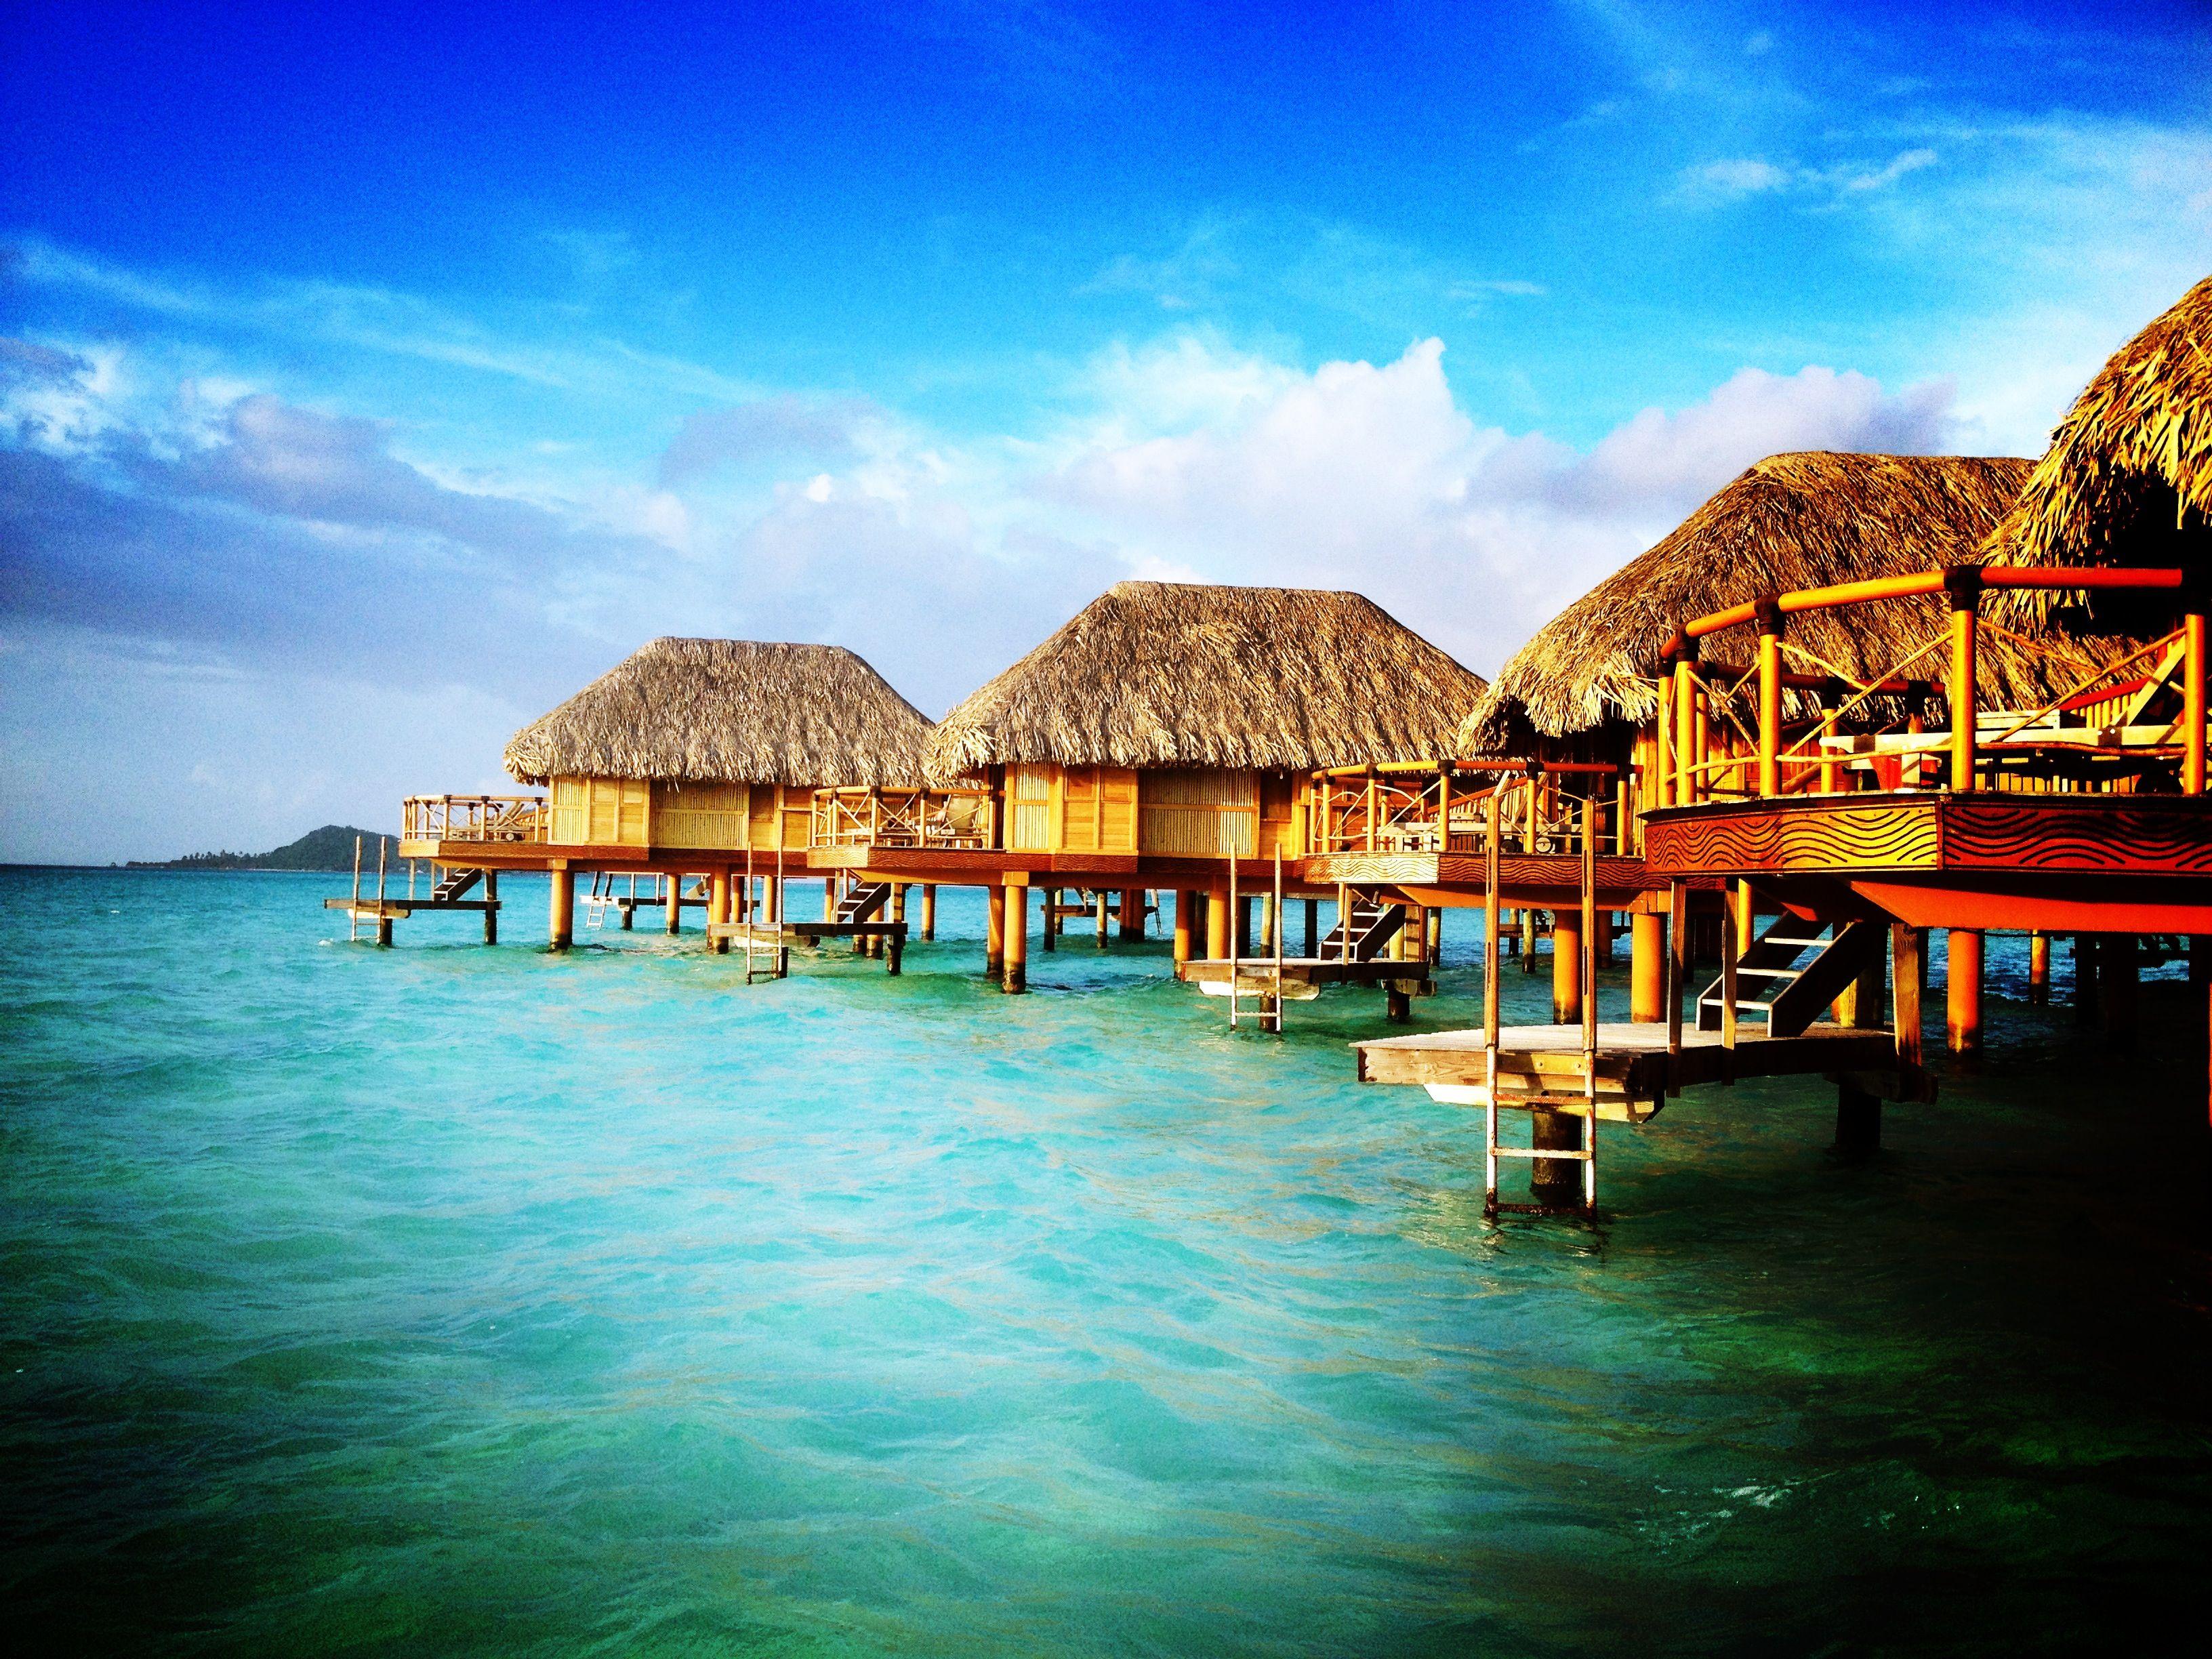 Phoneography Challenge: Overwater bungalows at the Bora Bora Pearl Beach Resort  @Photojojo  @Brit Morin